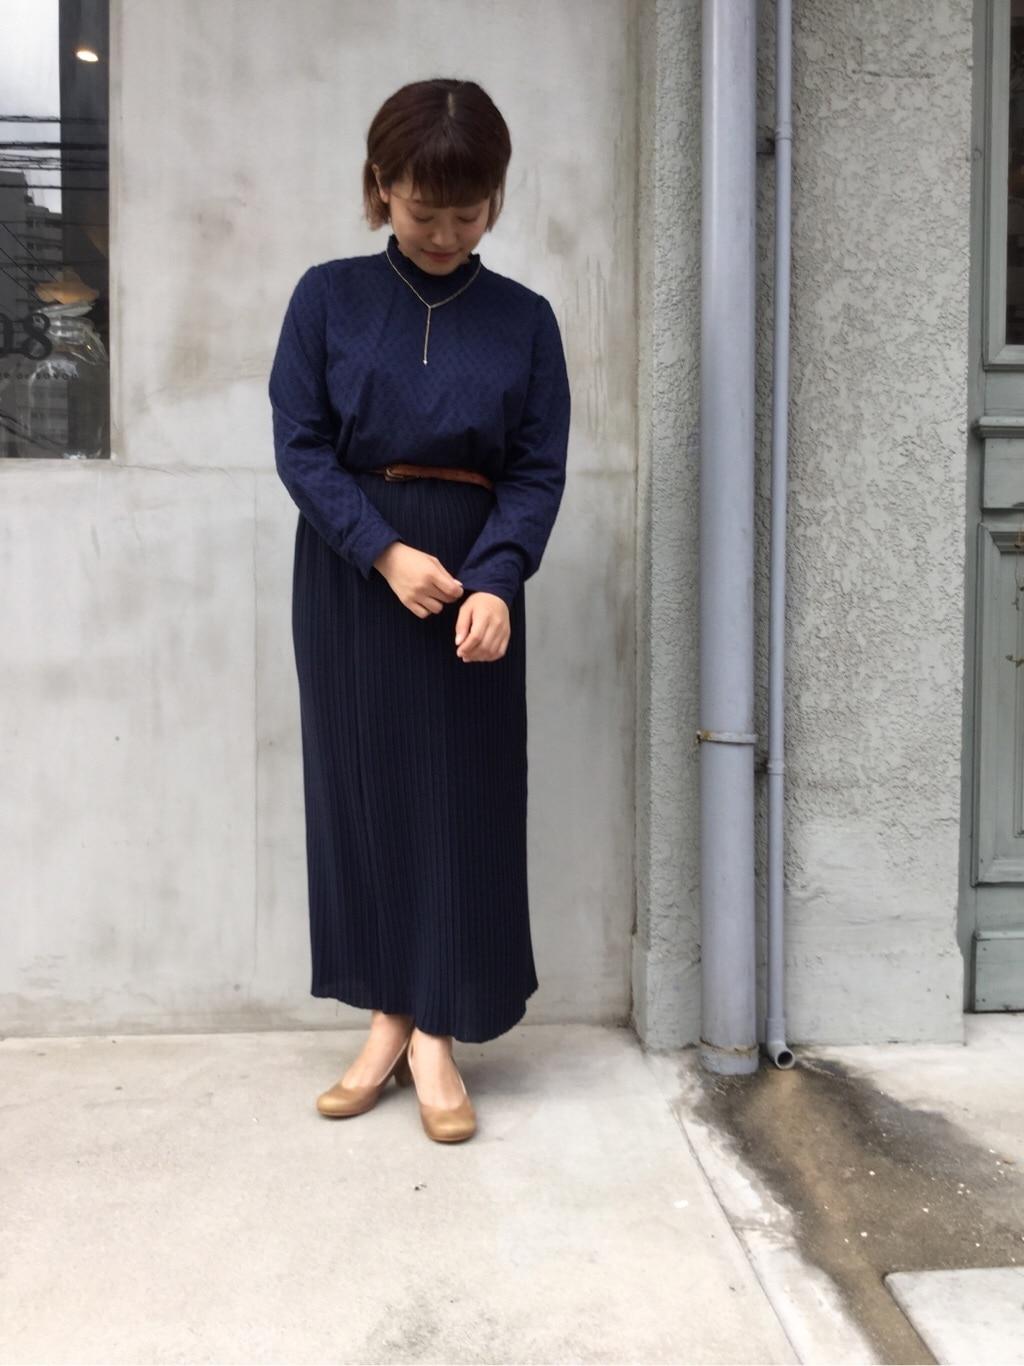 108 yuni / bulle de savon 福岡薬院路面 身長:150cm 2019.07.17